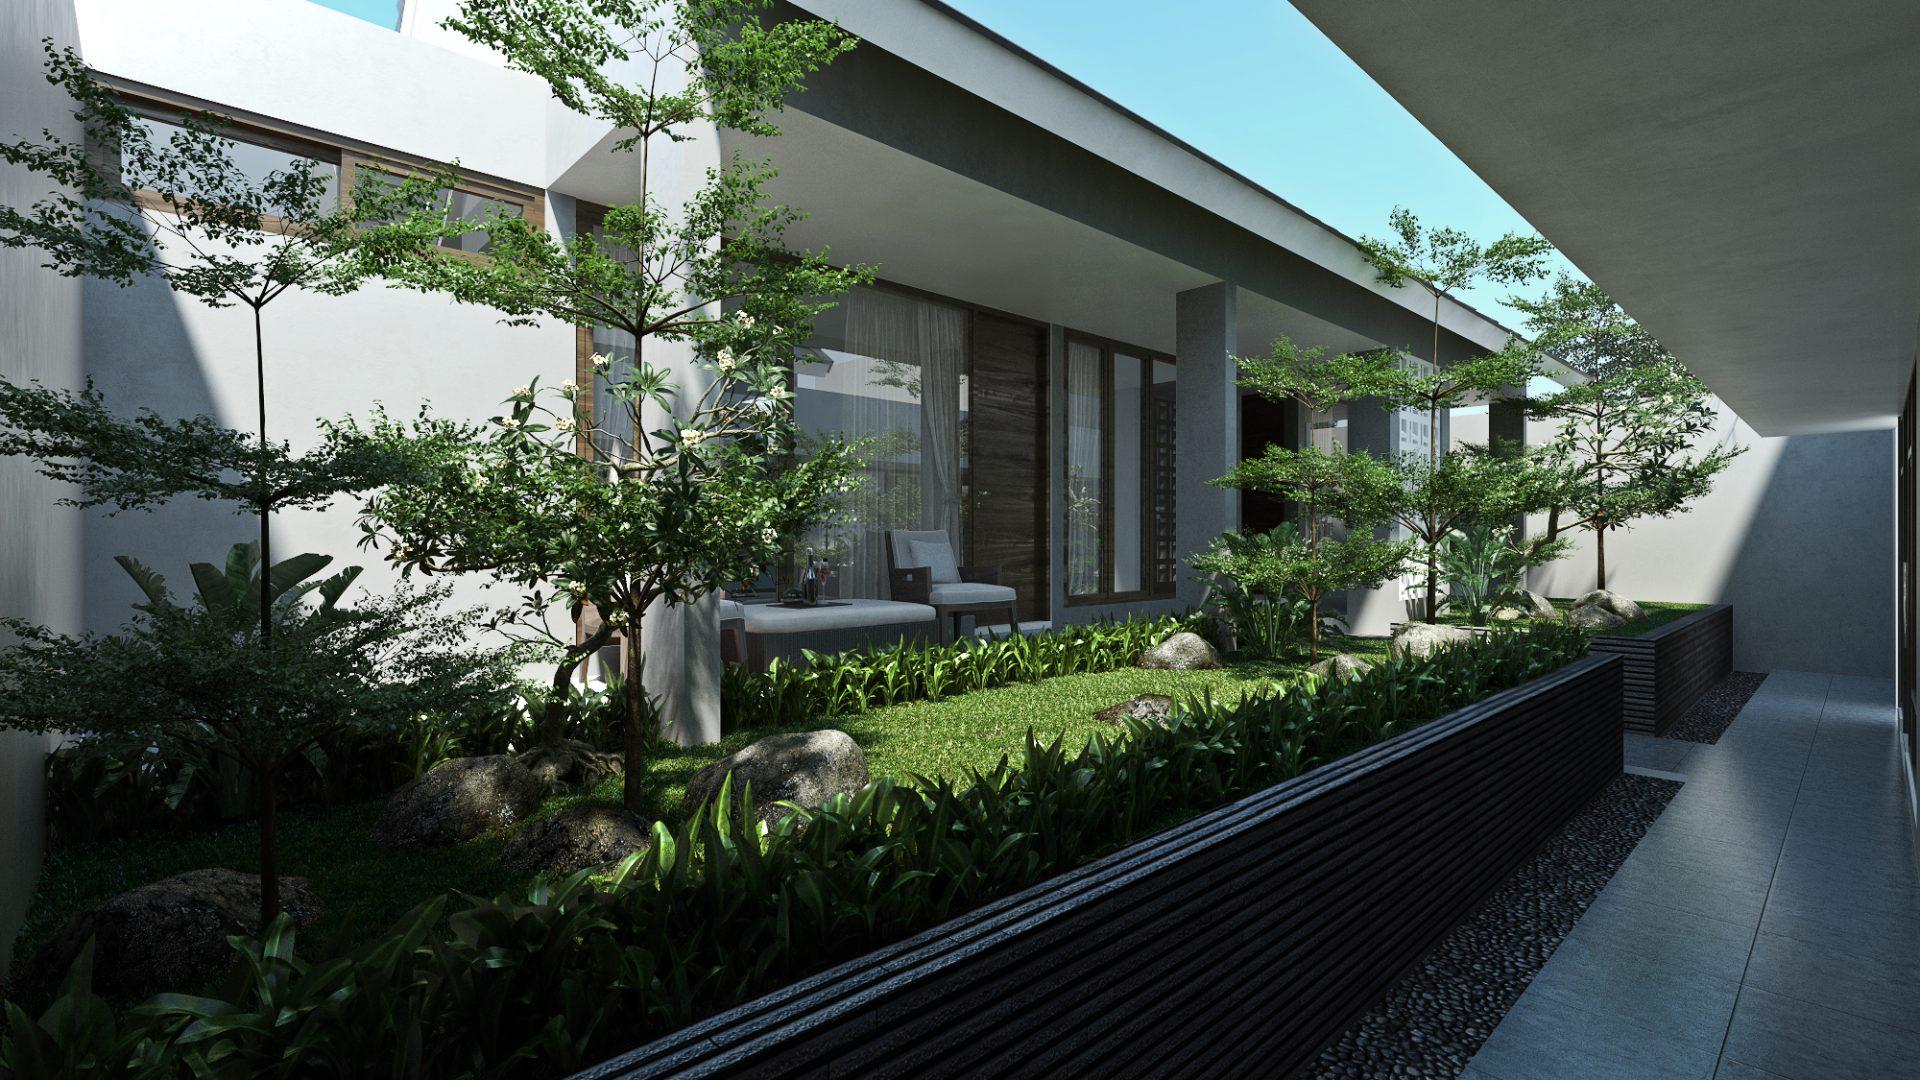 L HOUSE VIEW 2